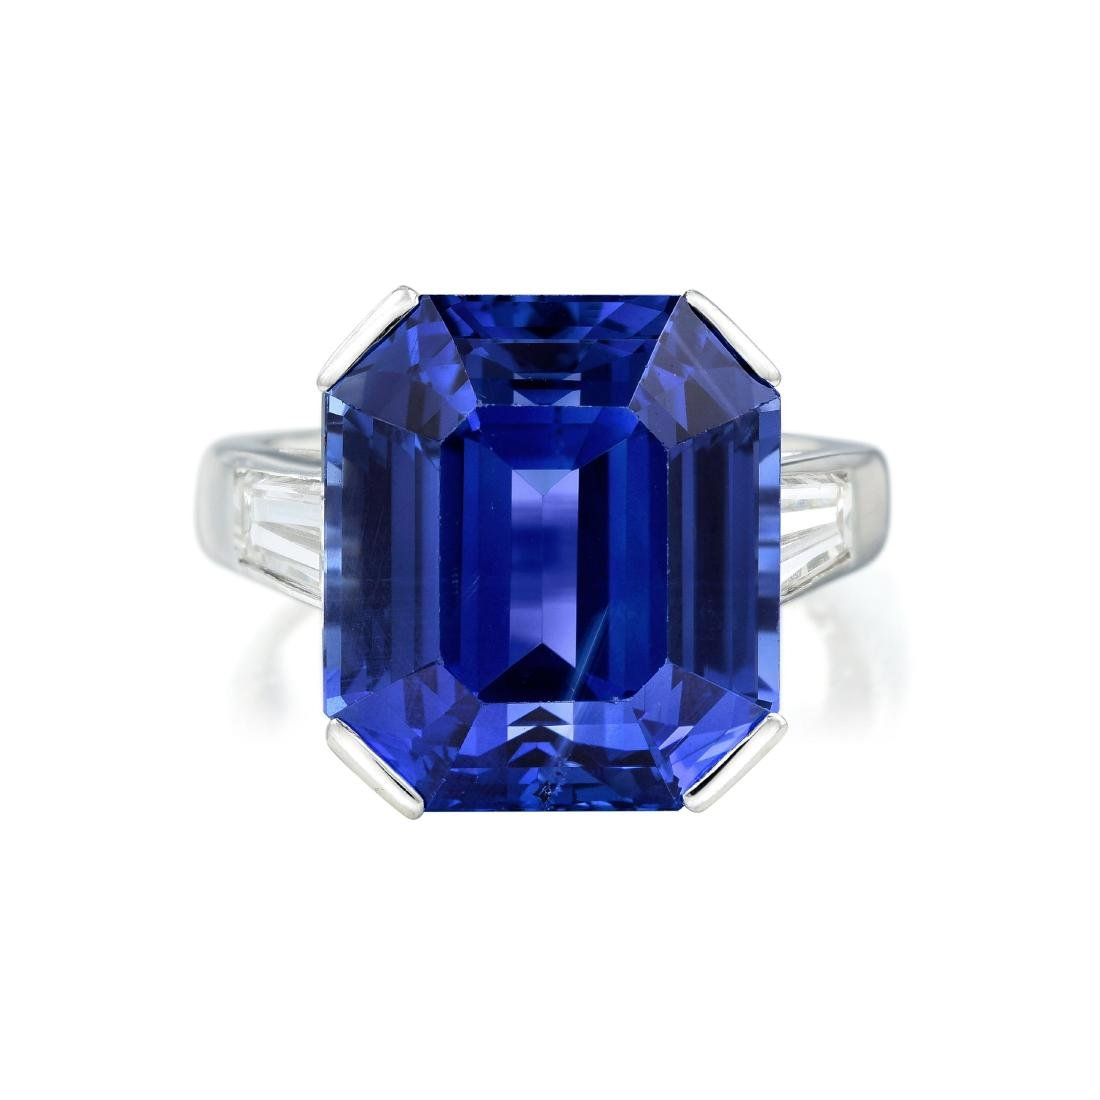 Art Deco 21.61-Carat Unheated Ceylon Sapphire and - 2